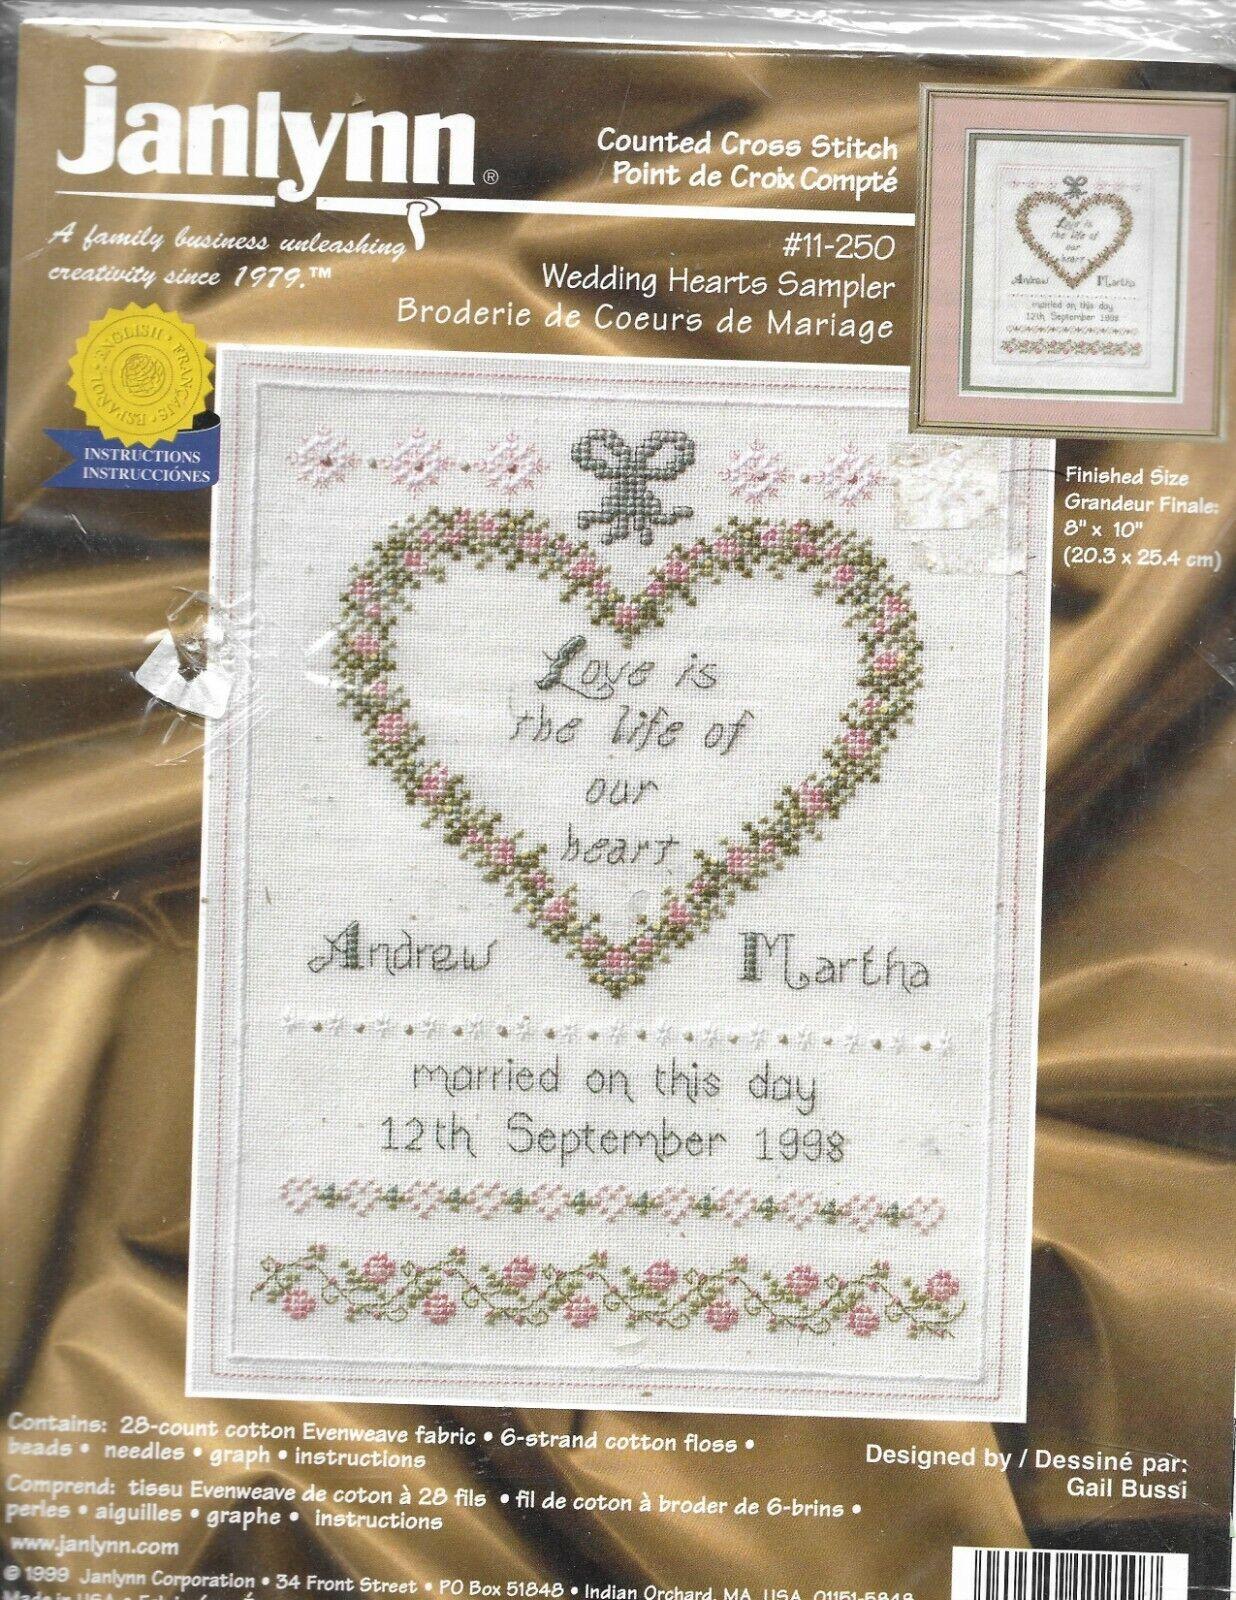 Janlynn WEDDING HEARTS SAMPLER Counted Cross Stitch Kit #11-